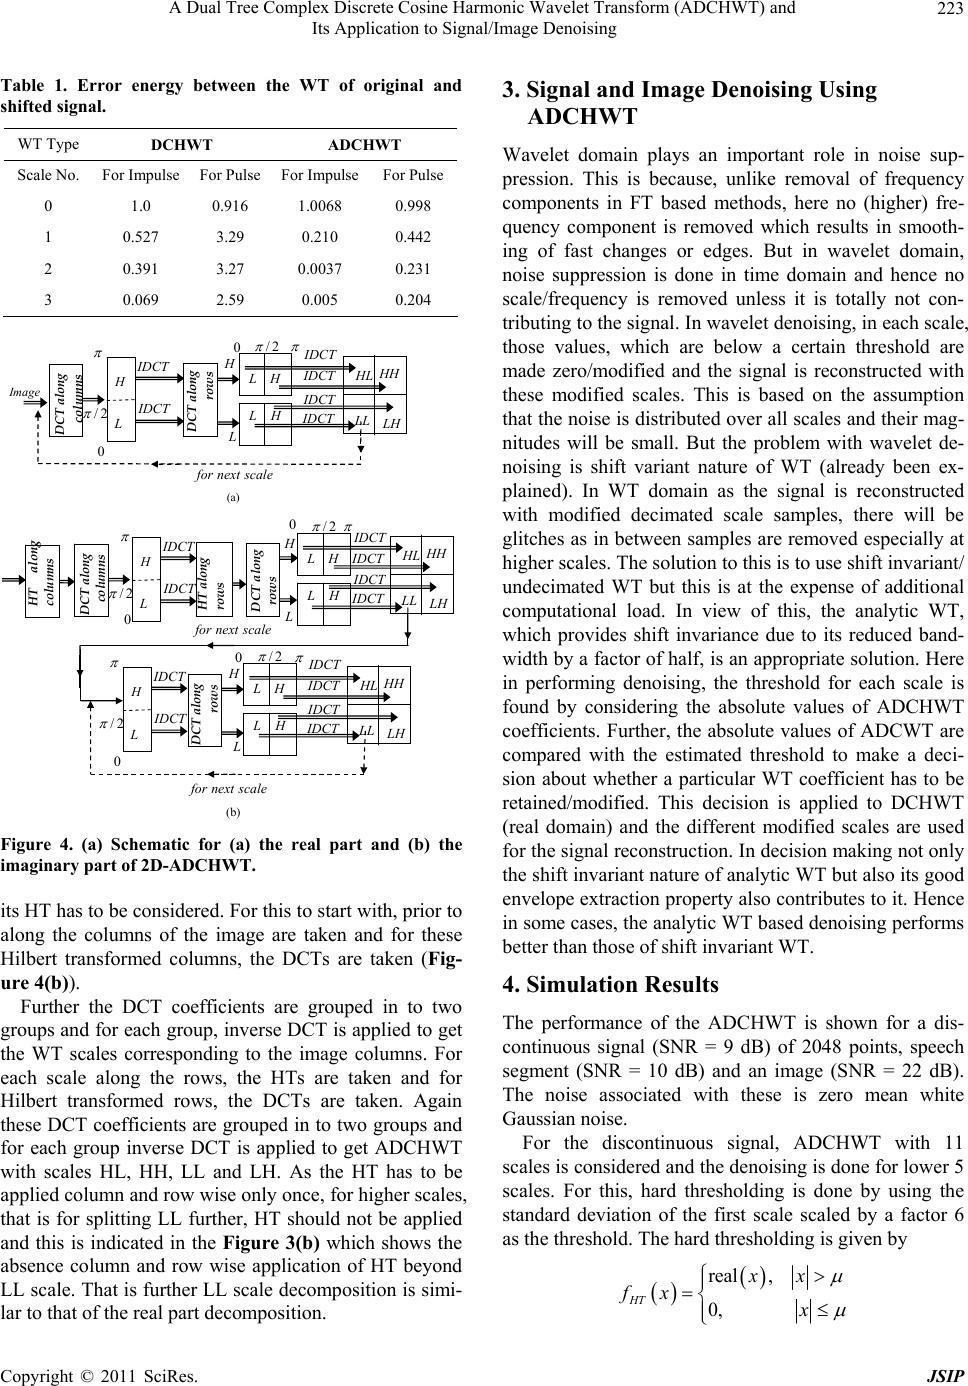 A Dual Tree Complex Discrete Cosine Harmonic Wavelet